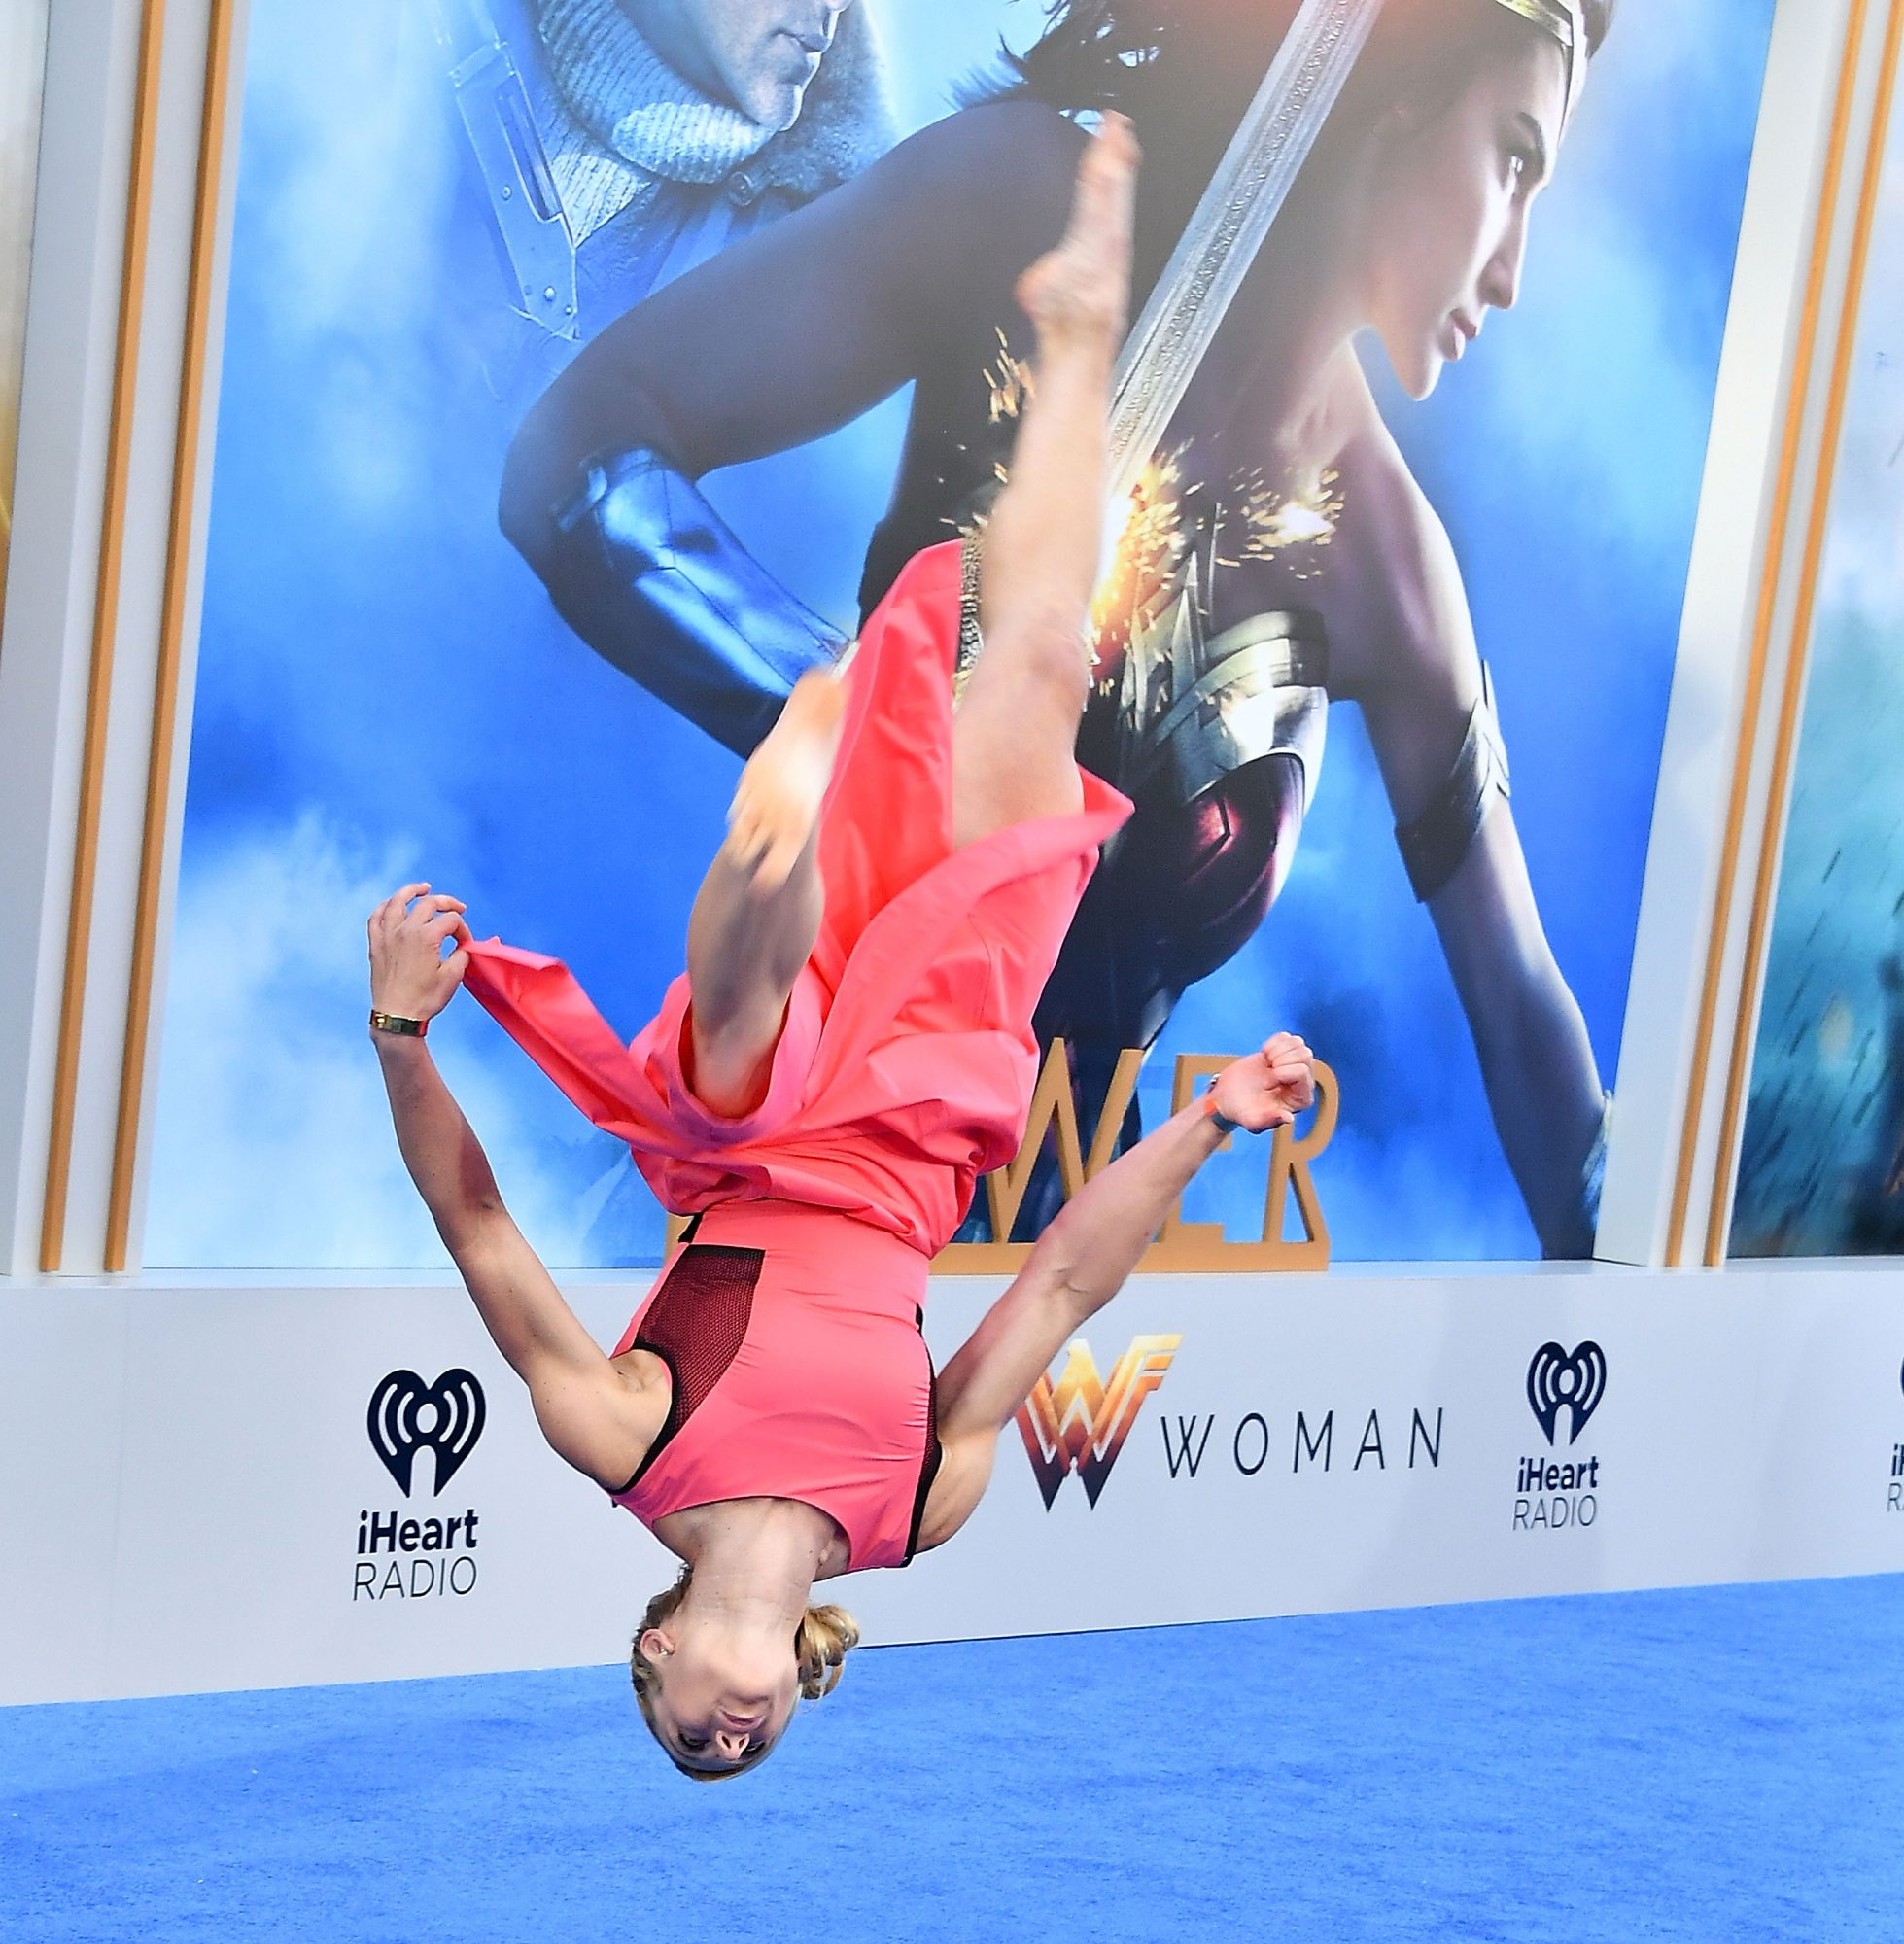 Jessie Graff is a stunt woman, a black belt and American